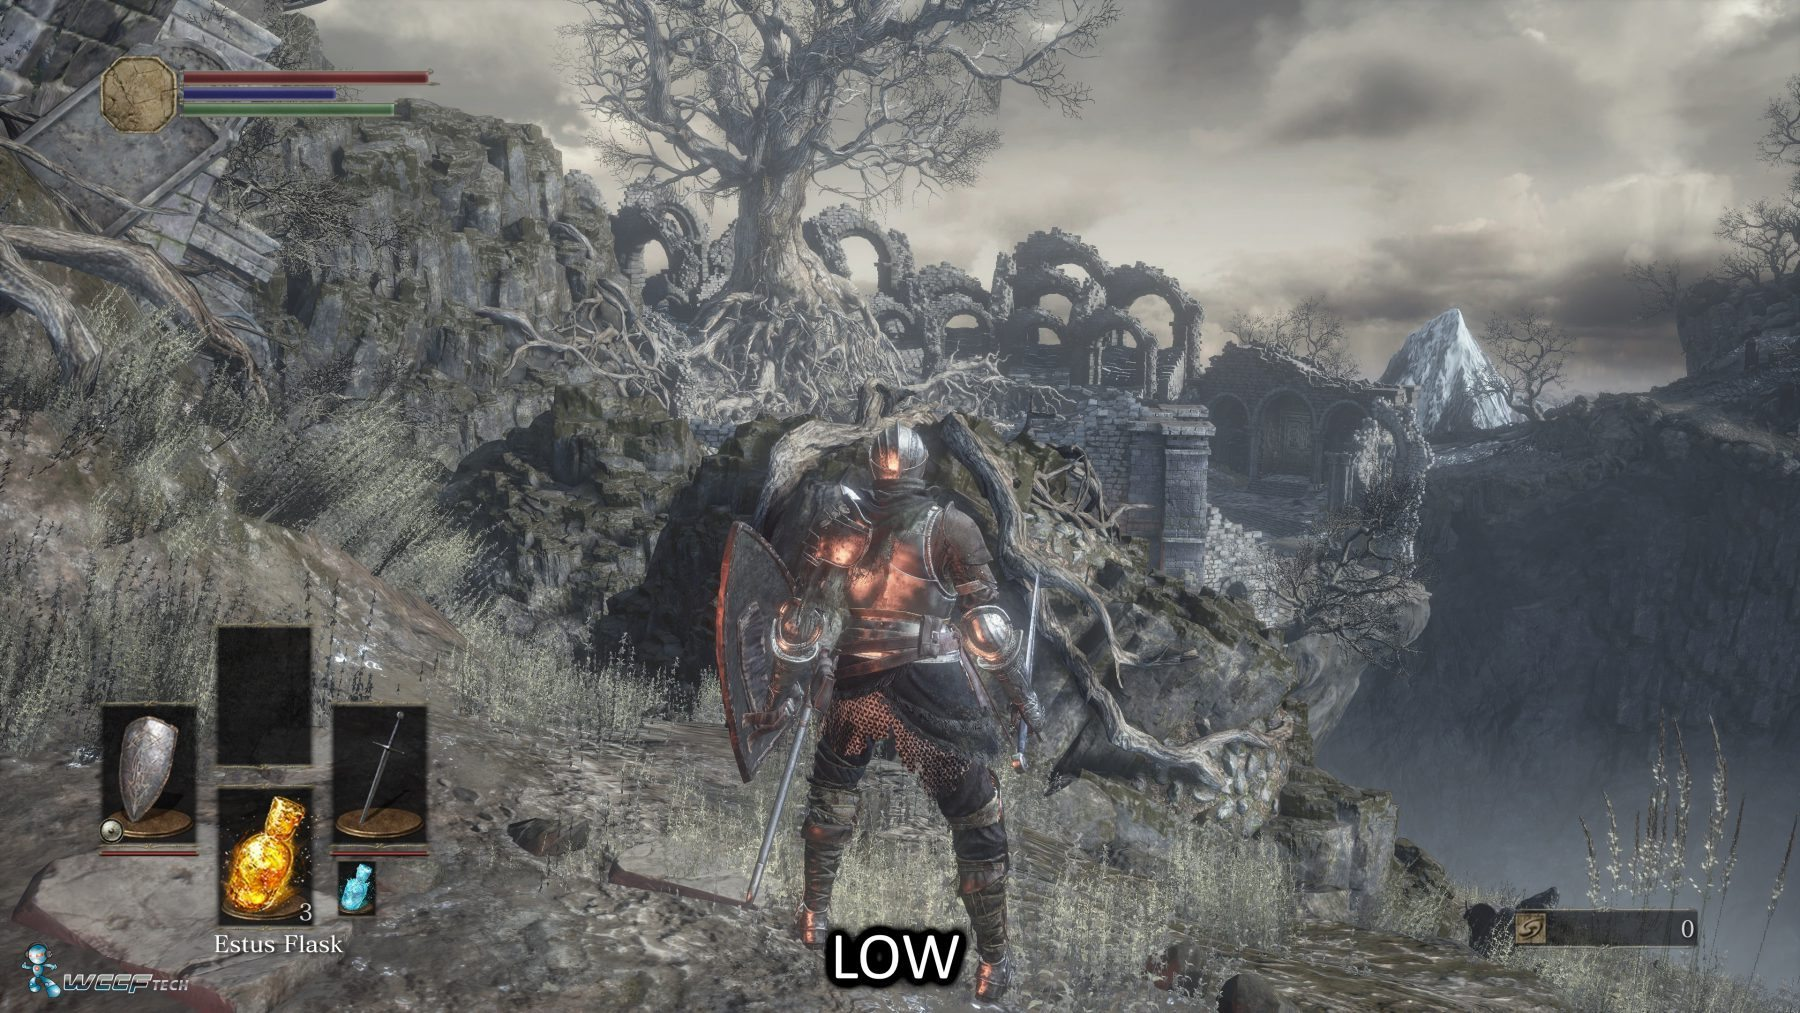 Dark Souls 3 low